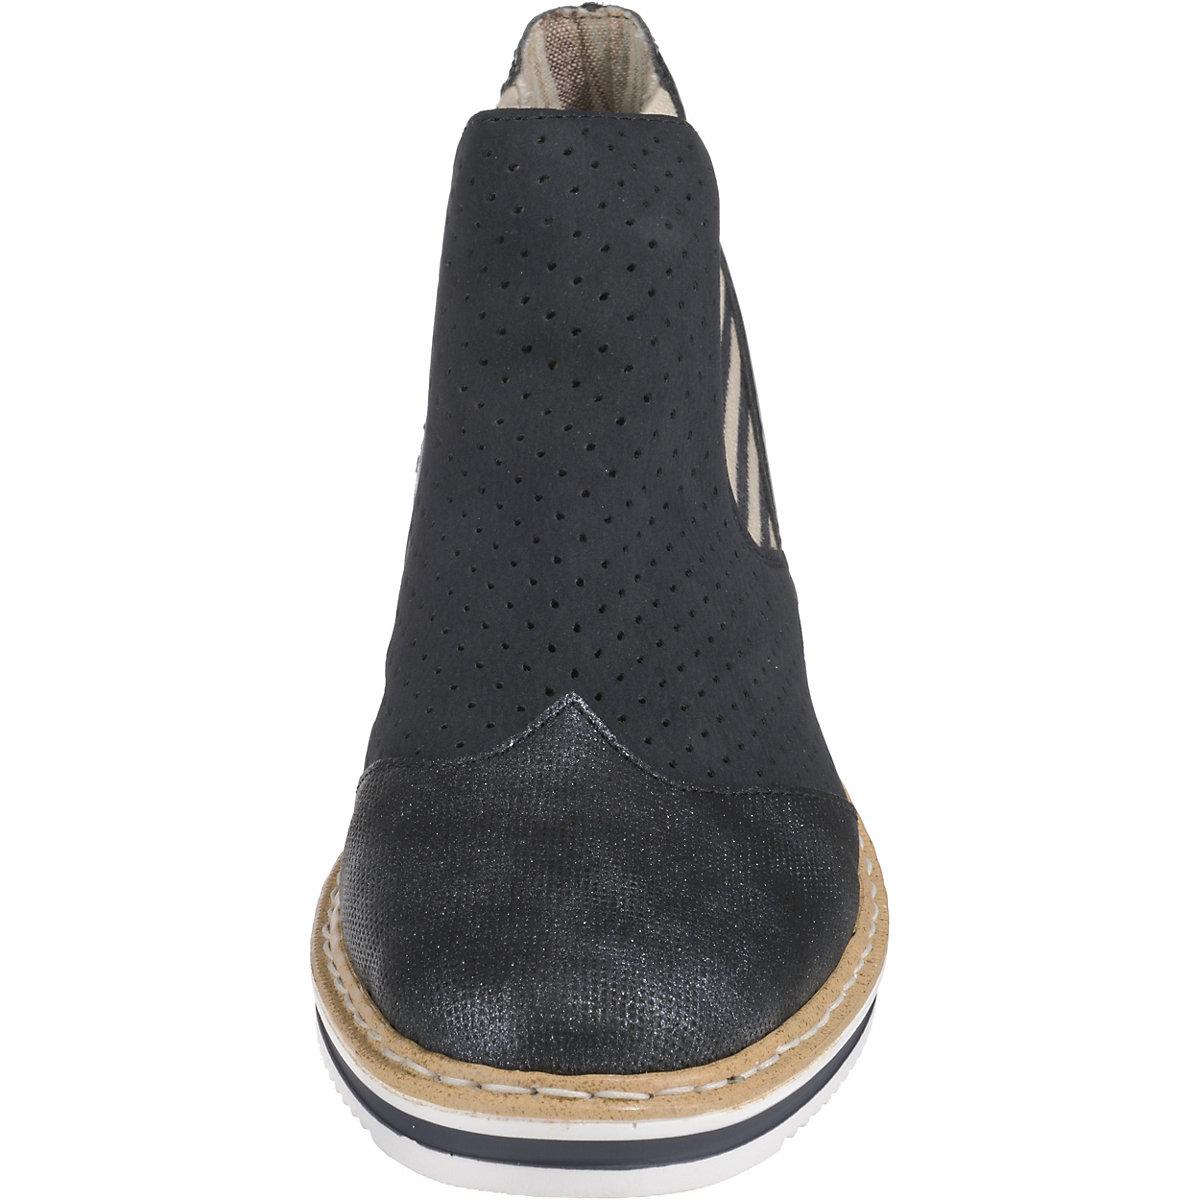 rieker Chelsea Boots dunkelblau